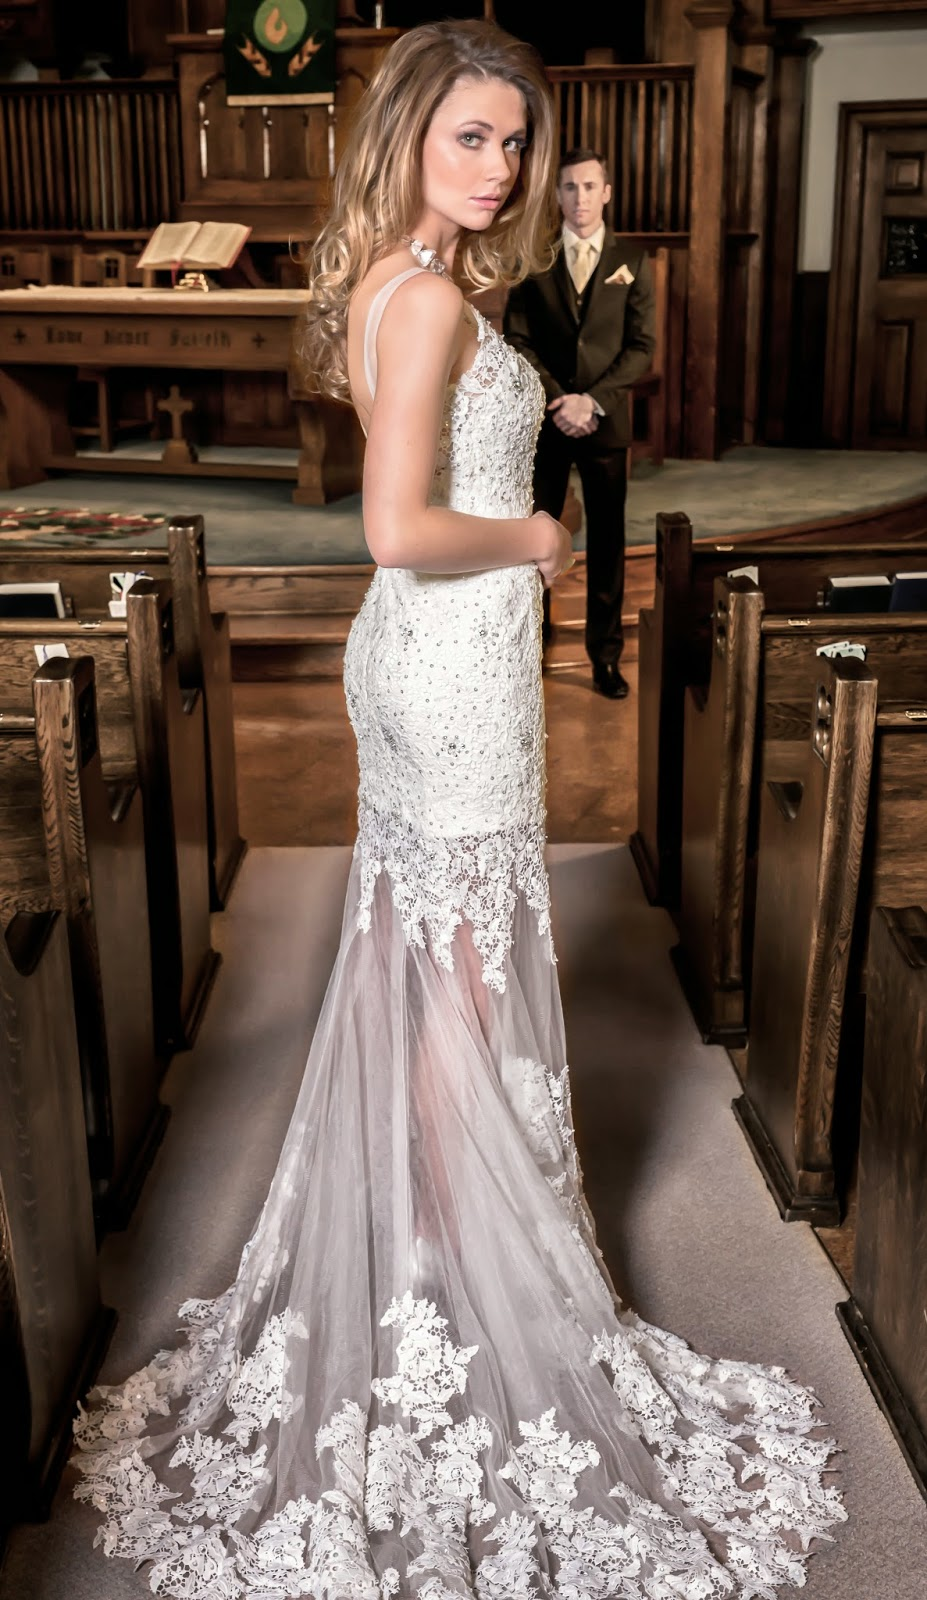 bb24717a24 Photographer  Cam Wood - Model  Vicki-Numa Models - MUA  Nicole Saxton Hair  Stylist  Stephanie Van Tassell - Fashion Stylist  Elena Harrison-Style  Concept